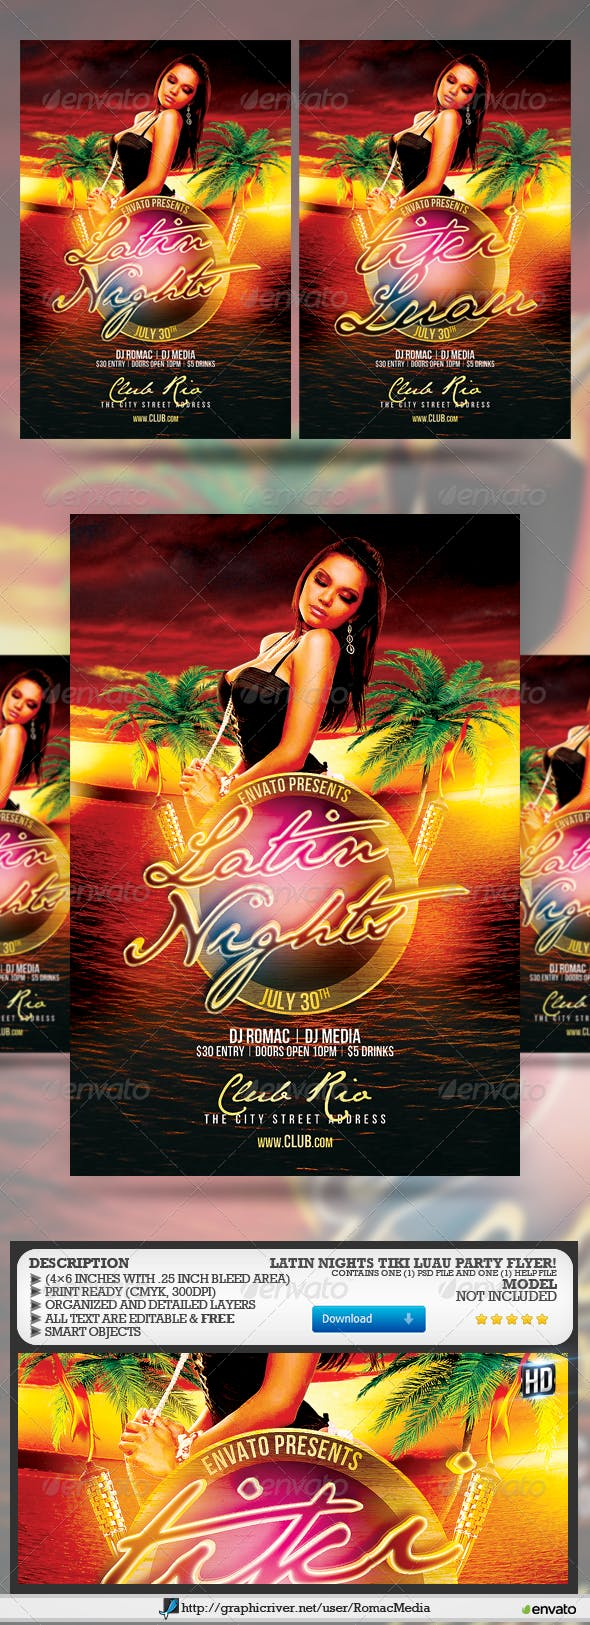 latin nights tiki luau flyer by romacmedia graphicriver